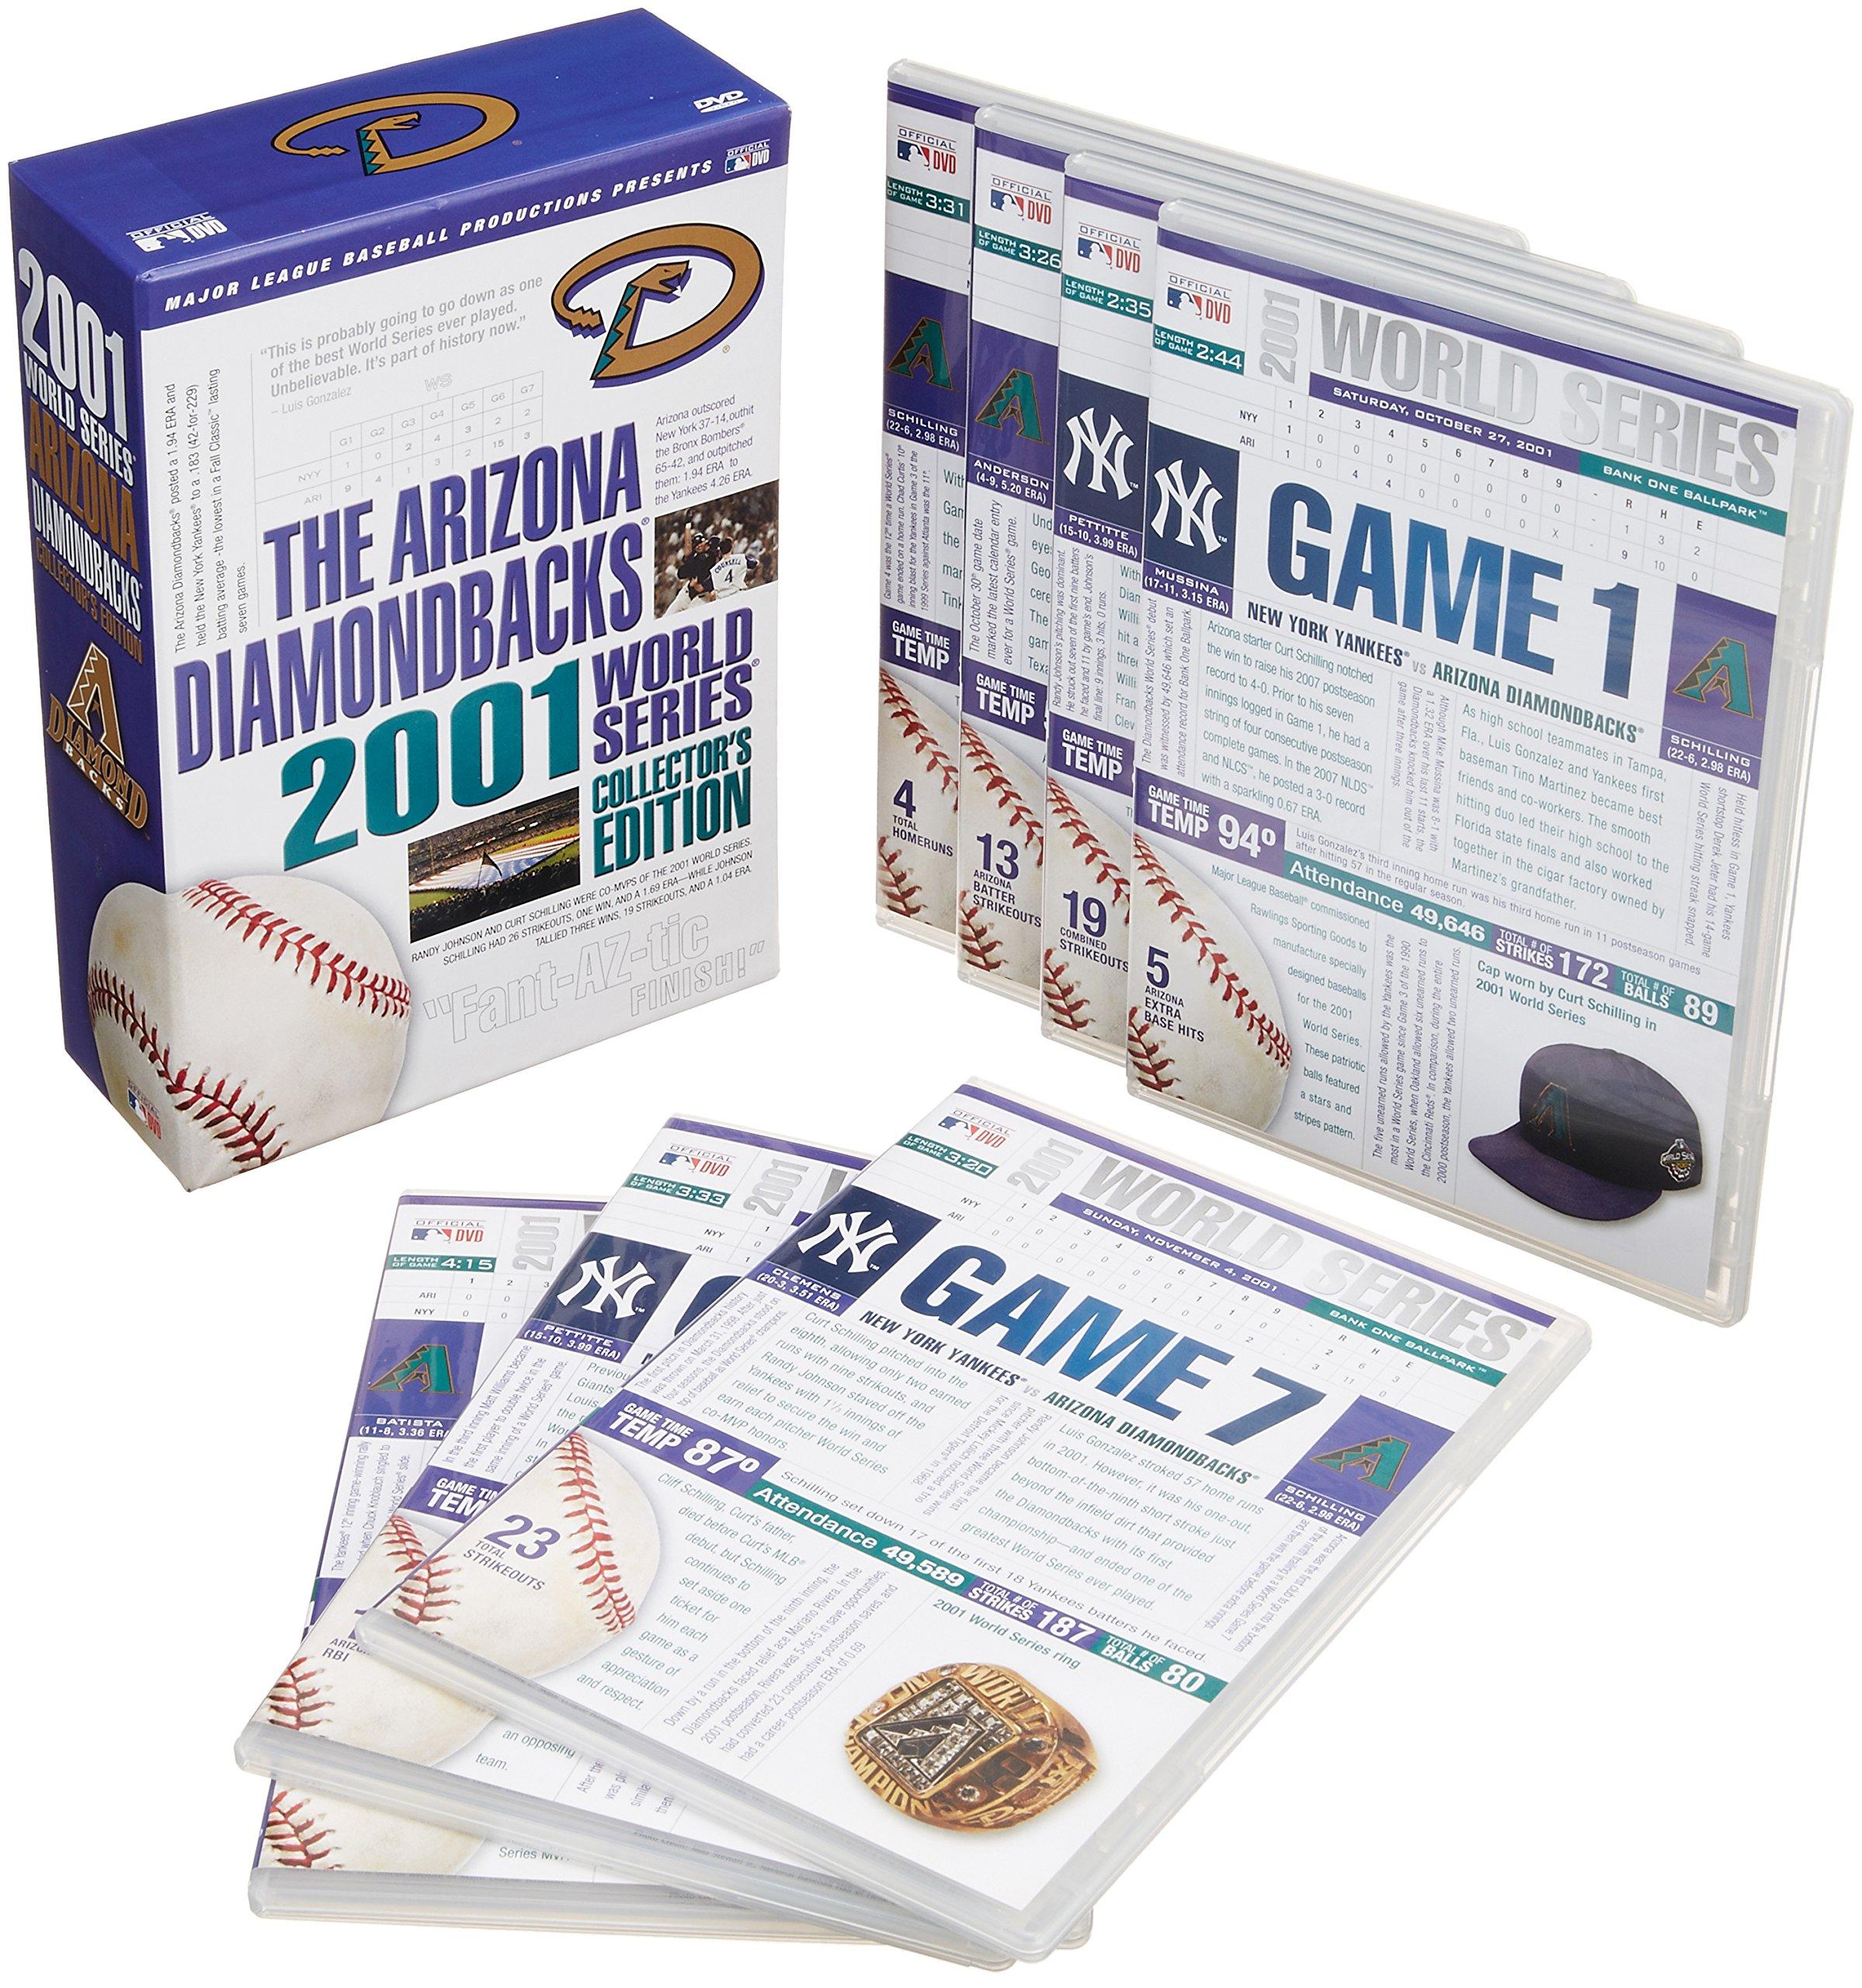 The Arizona Diamondbacks 2001 World Series Collector's Edition [DVD] by A&E